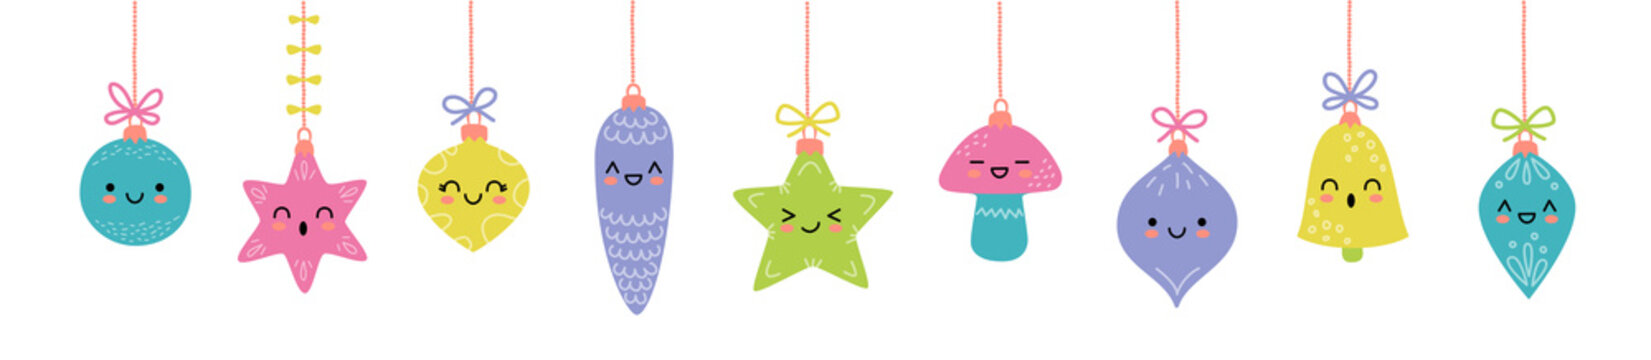 Kawaii Christmas Stock Photos And Royalty Free Images Vectors And Illustrations Adobe Stock See more ideas about anime christmas, anime, anime art. kawaii christmas stock photos and